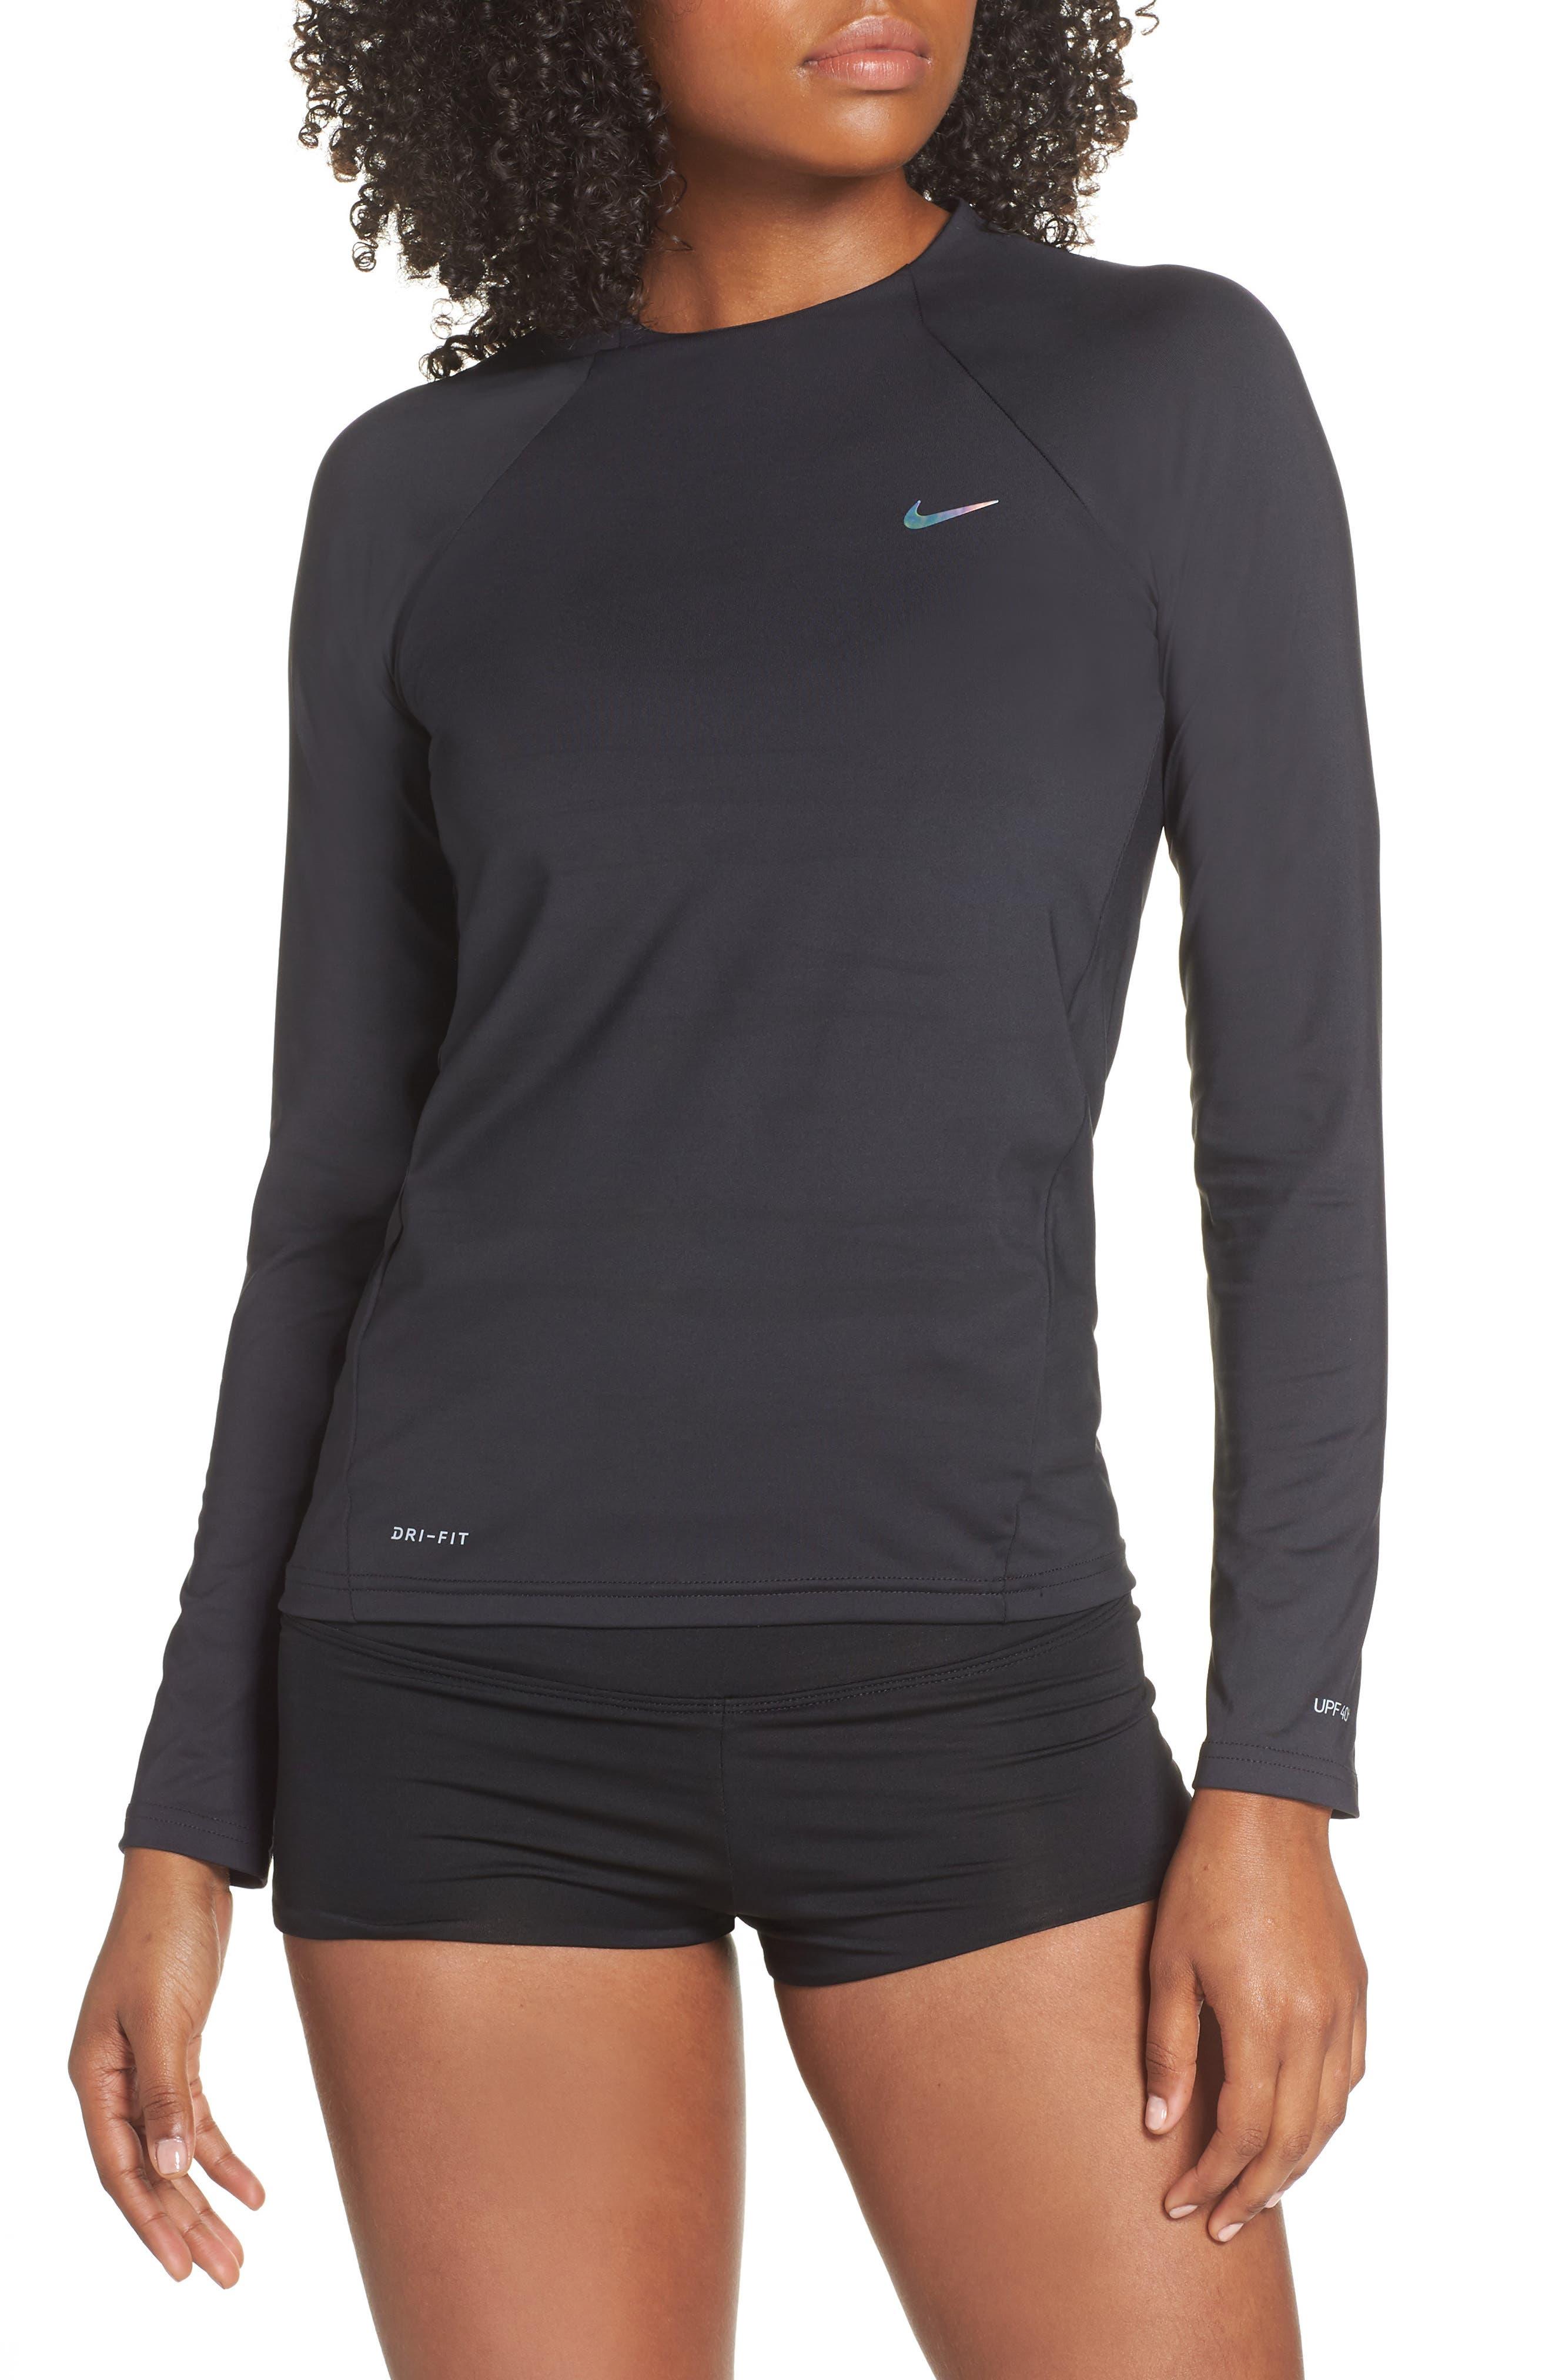 Nike Long Sleeve Hydroguard Shirt, Black